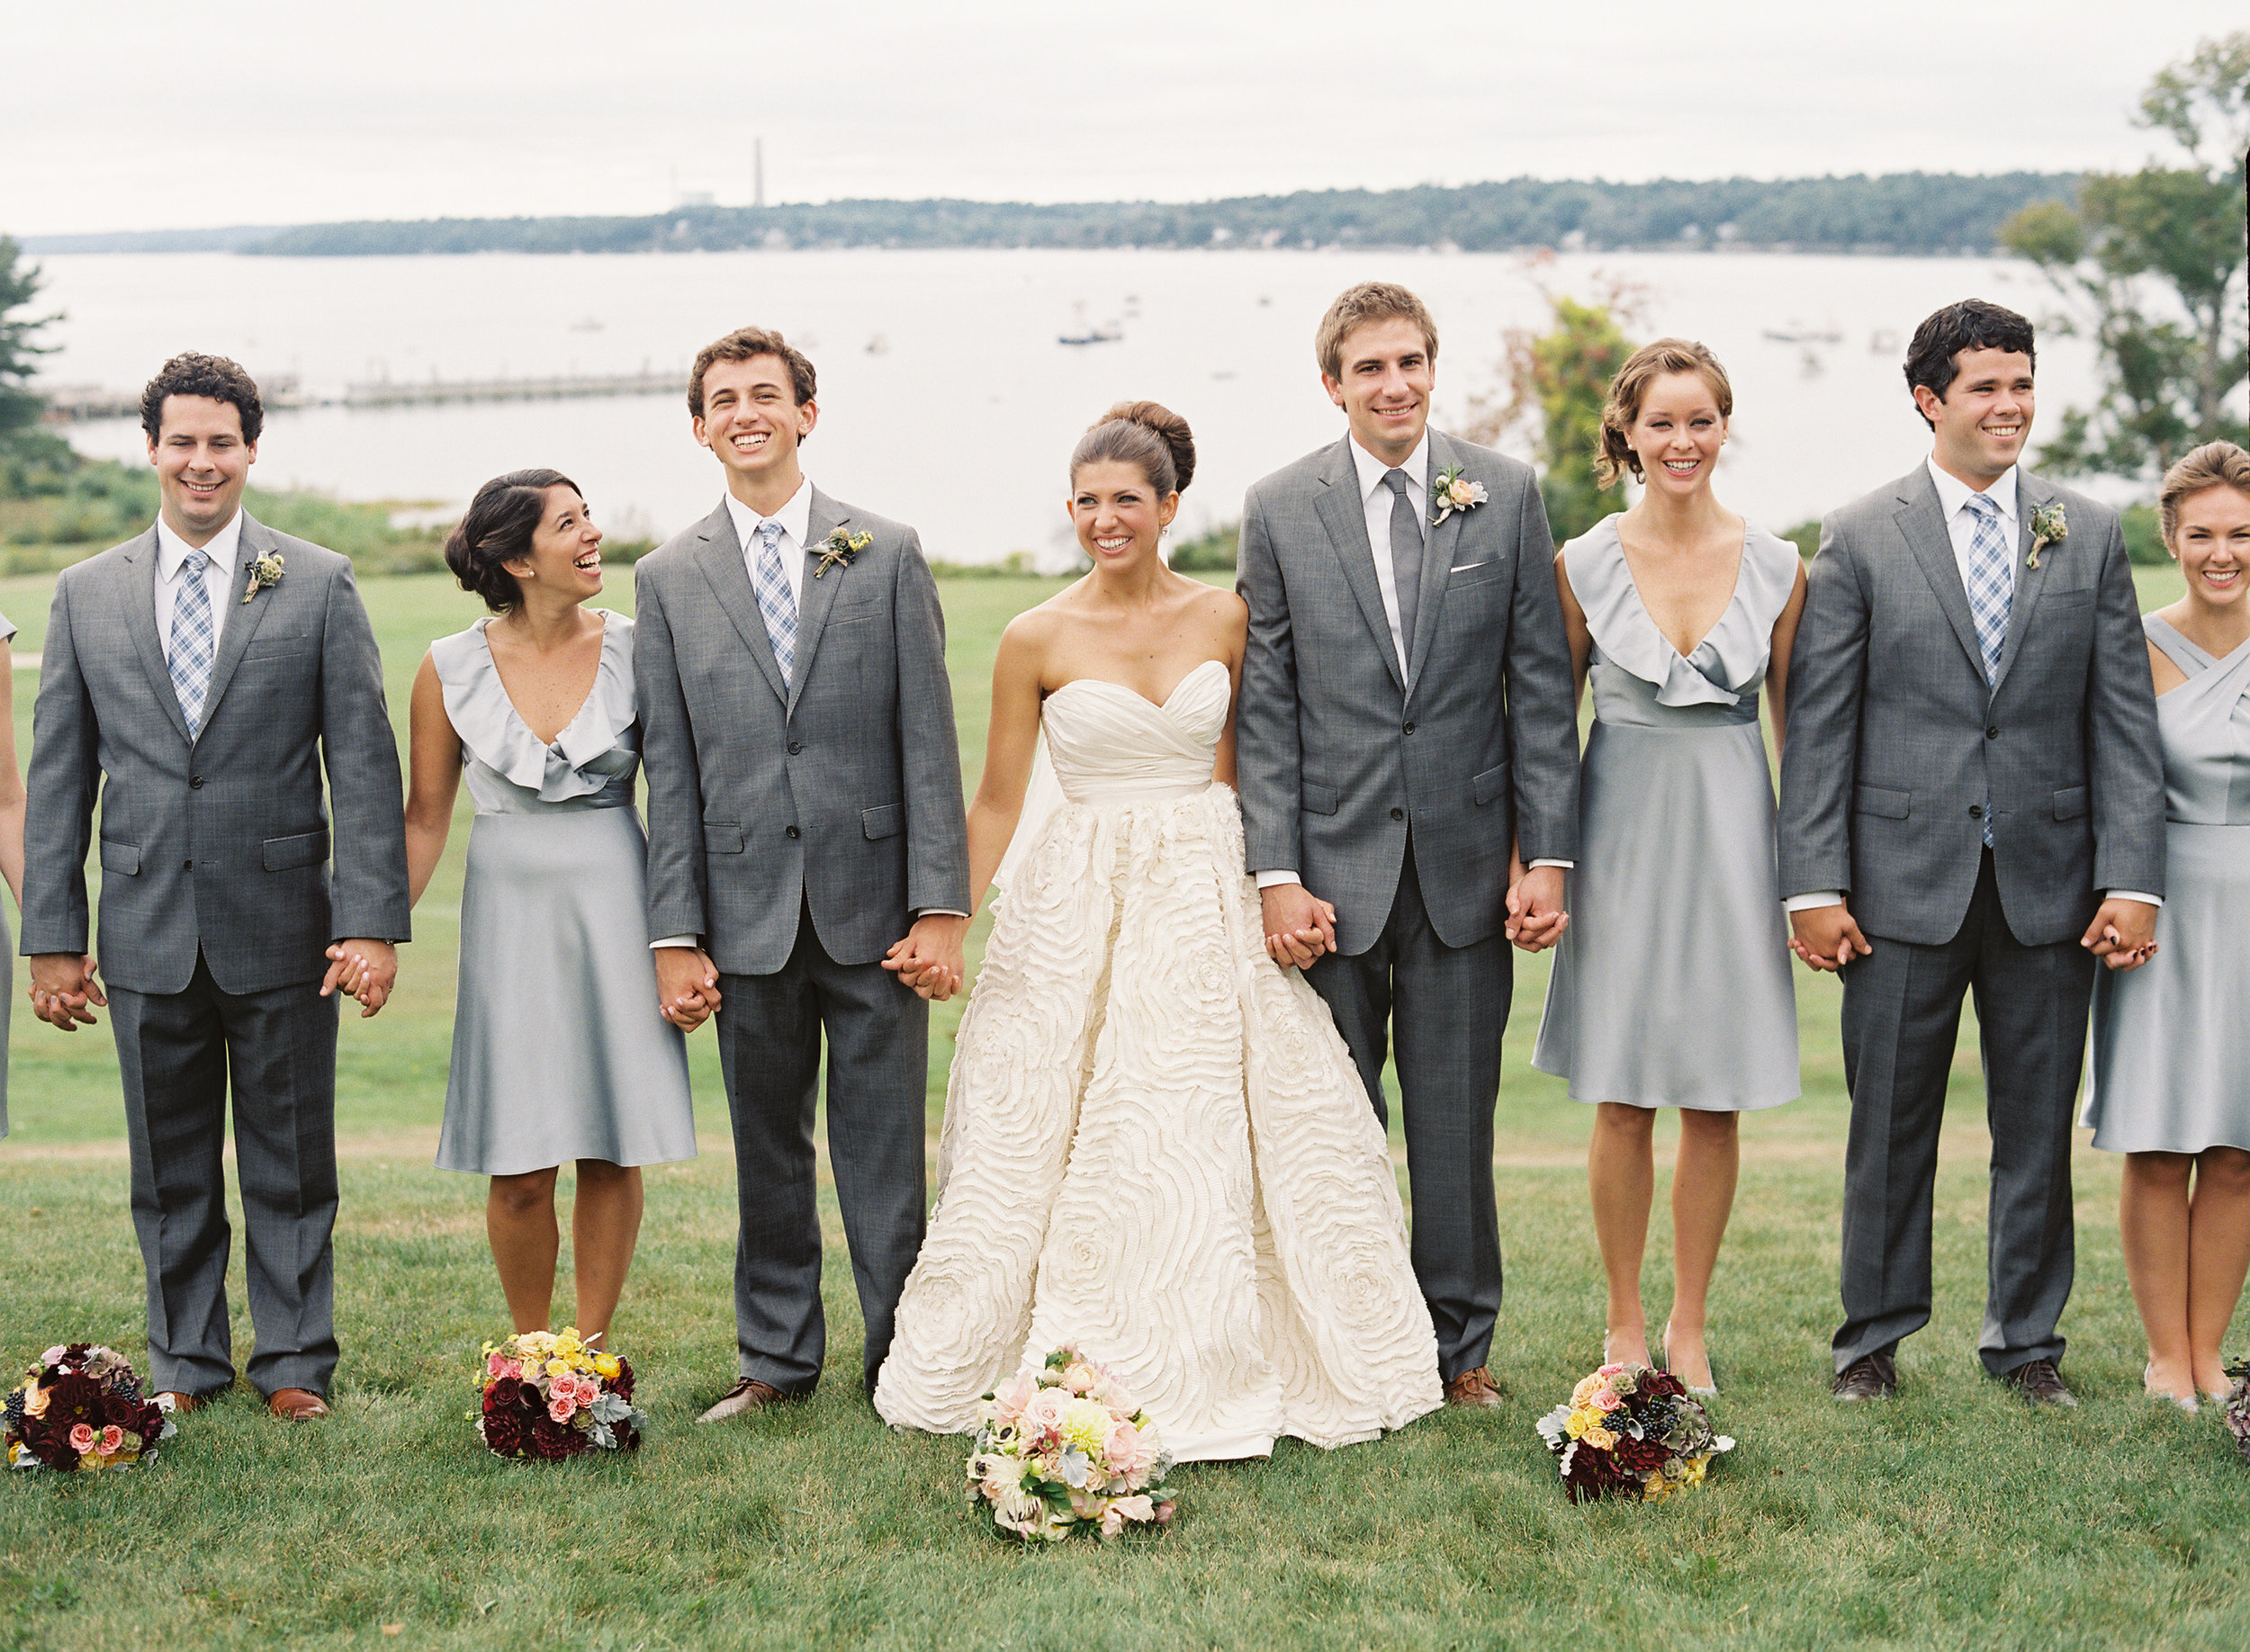 chebeague_island_inn_wedding_gabe_aceves018.JPG